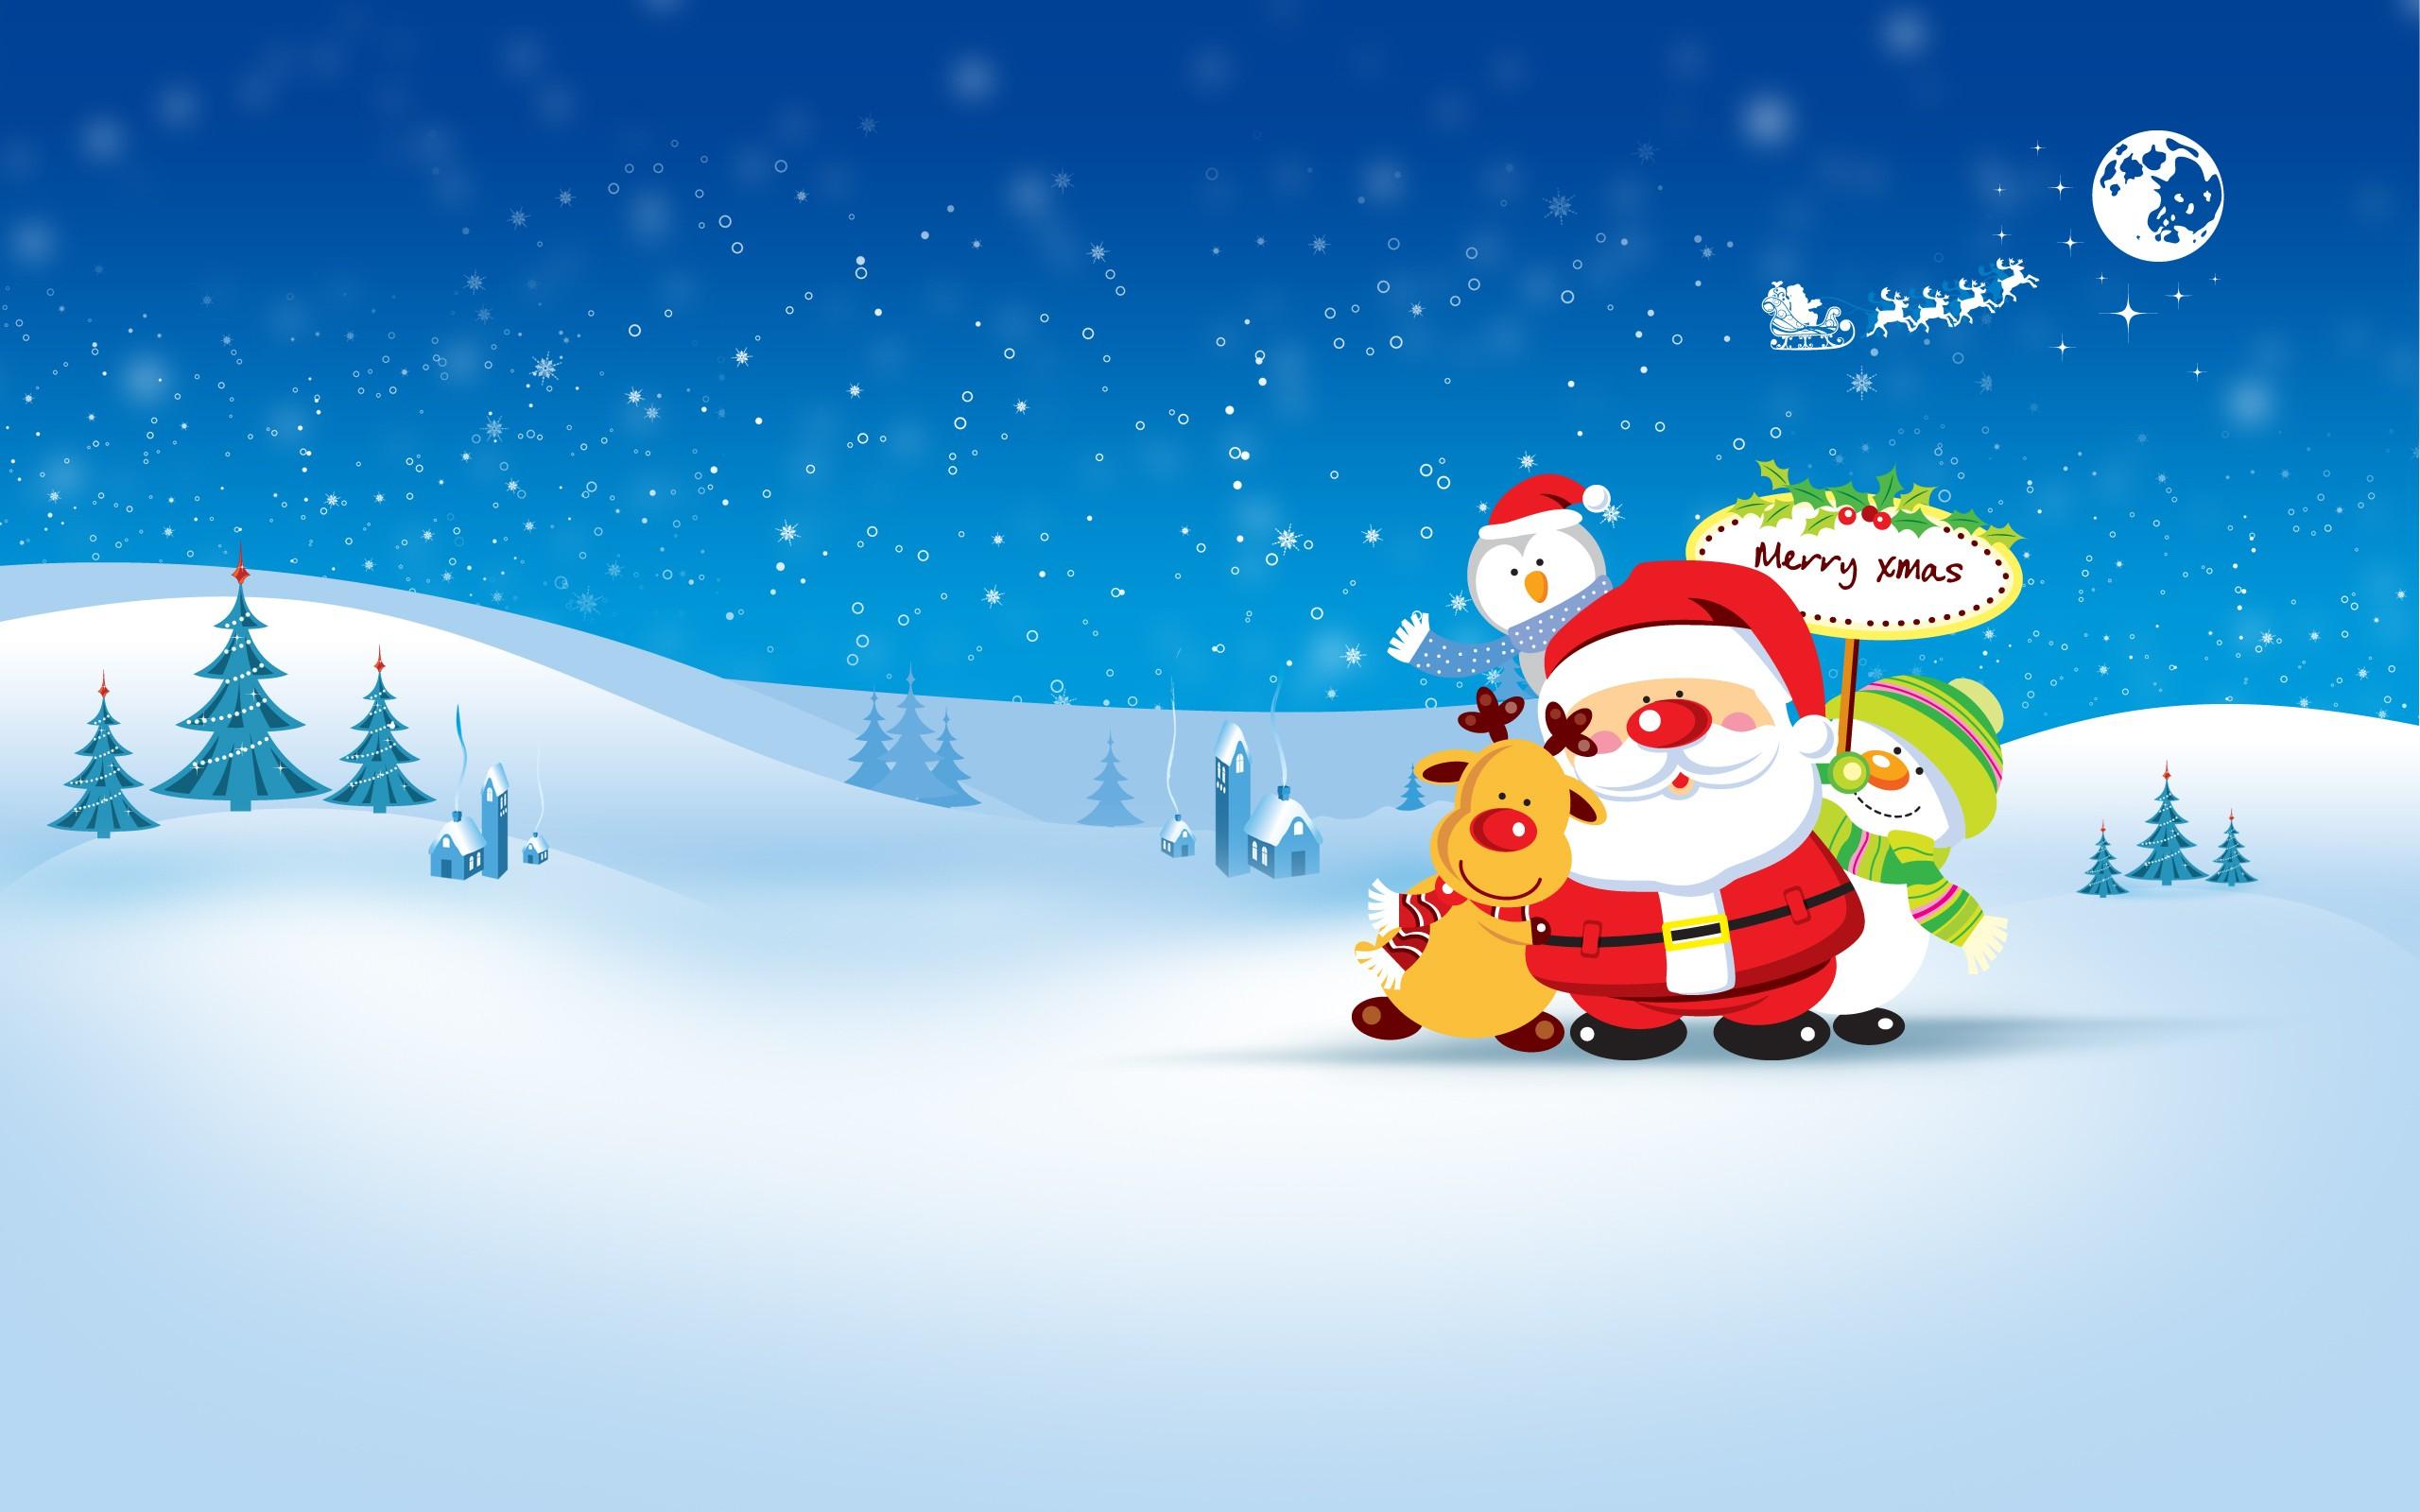 Fondos De Pantalla Navidenos Gratis: Fondos Navidad Animados Gratis